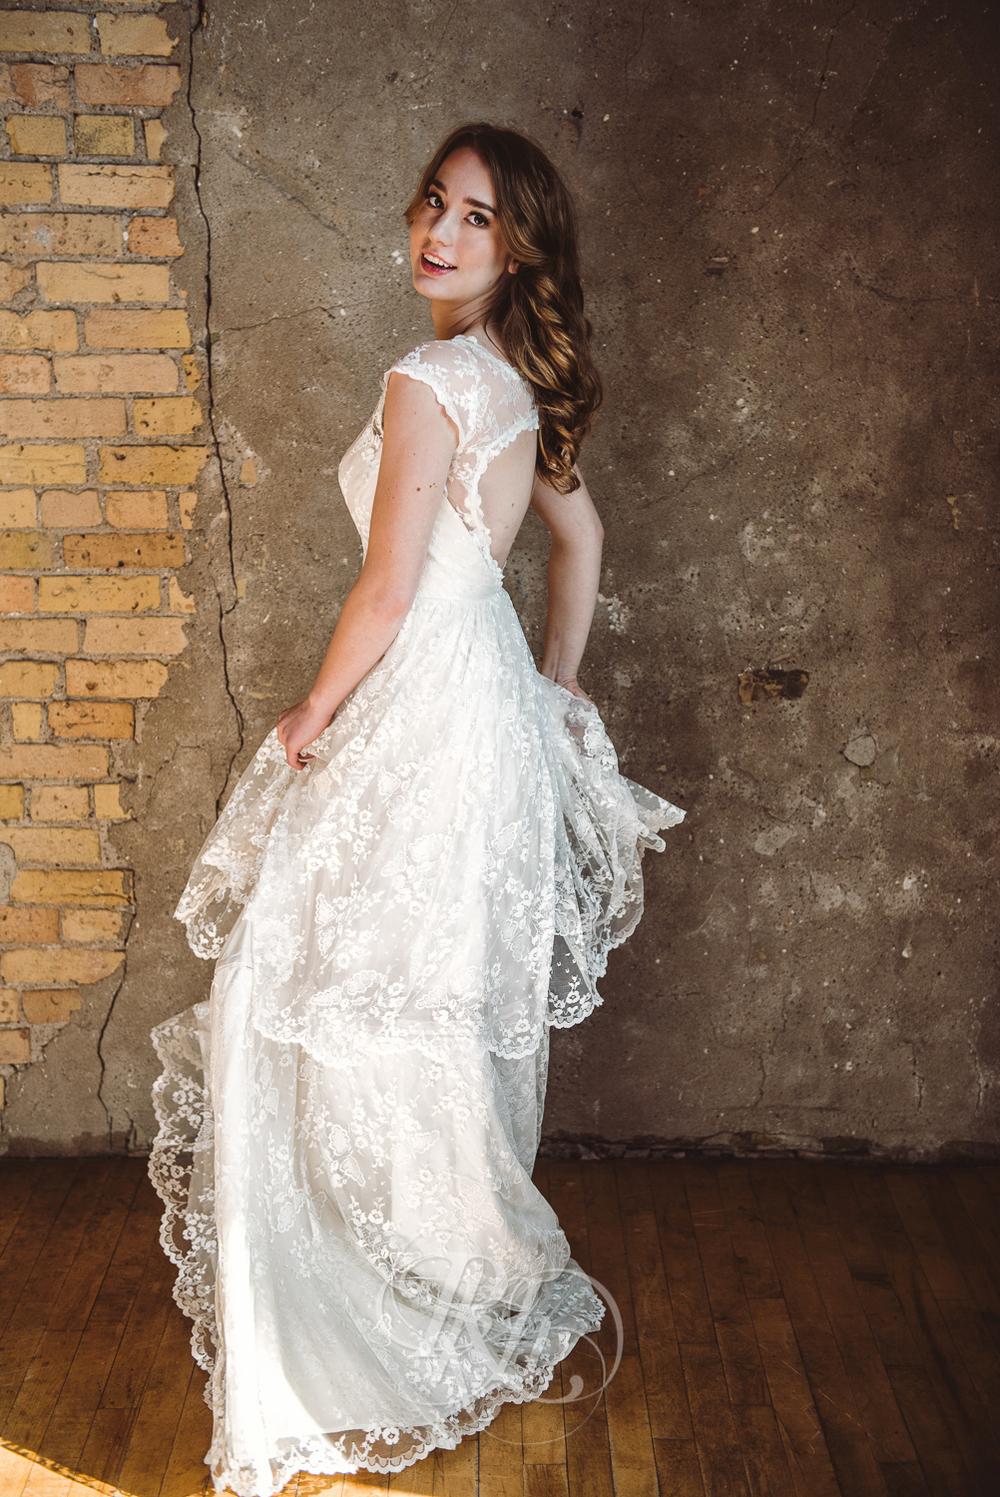 Minneapolis Wedding Shoot - RKH Images - Minnesota Wedding Photographer - Samples-31